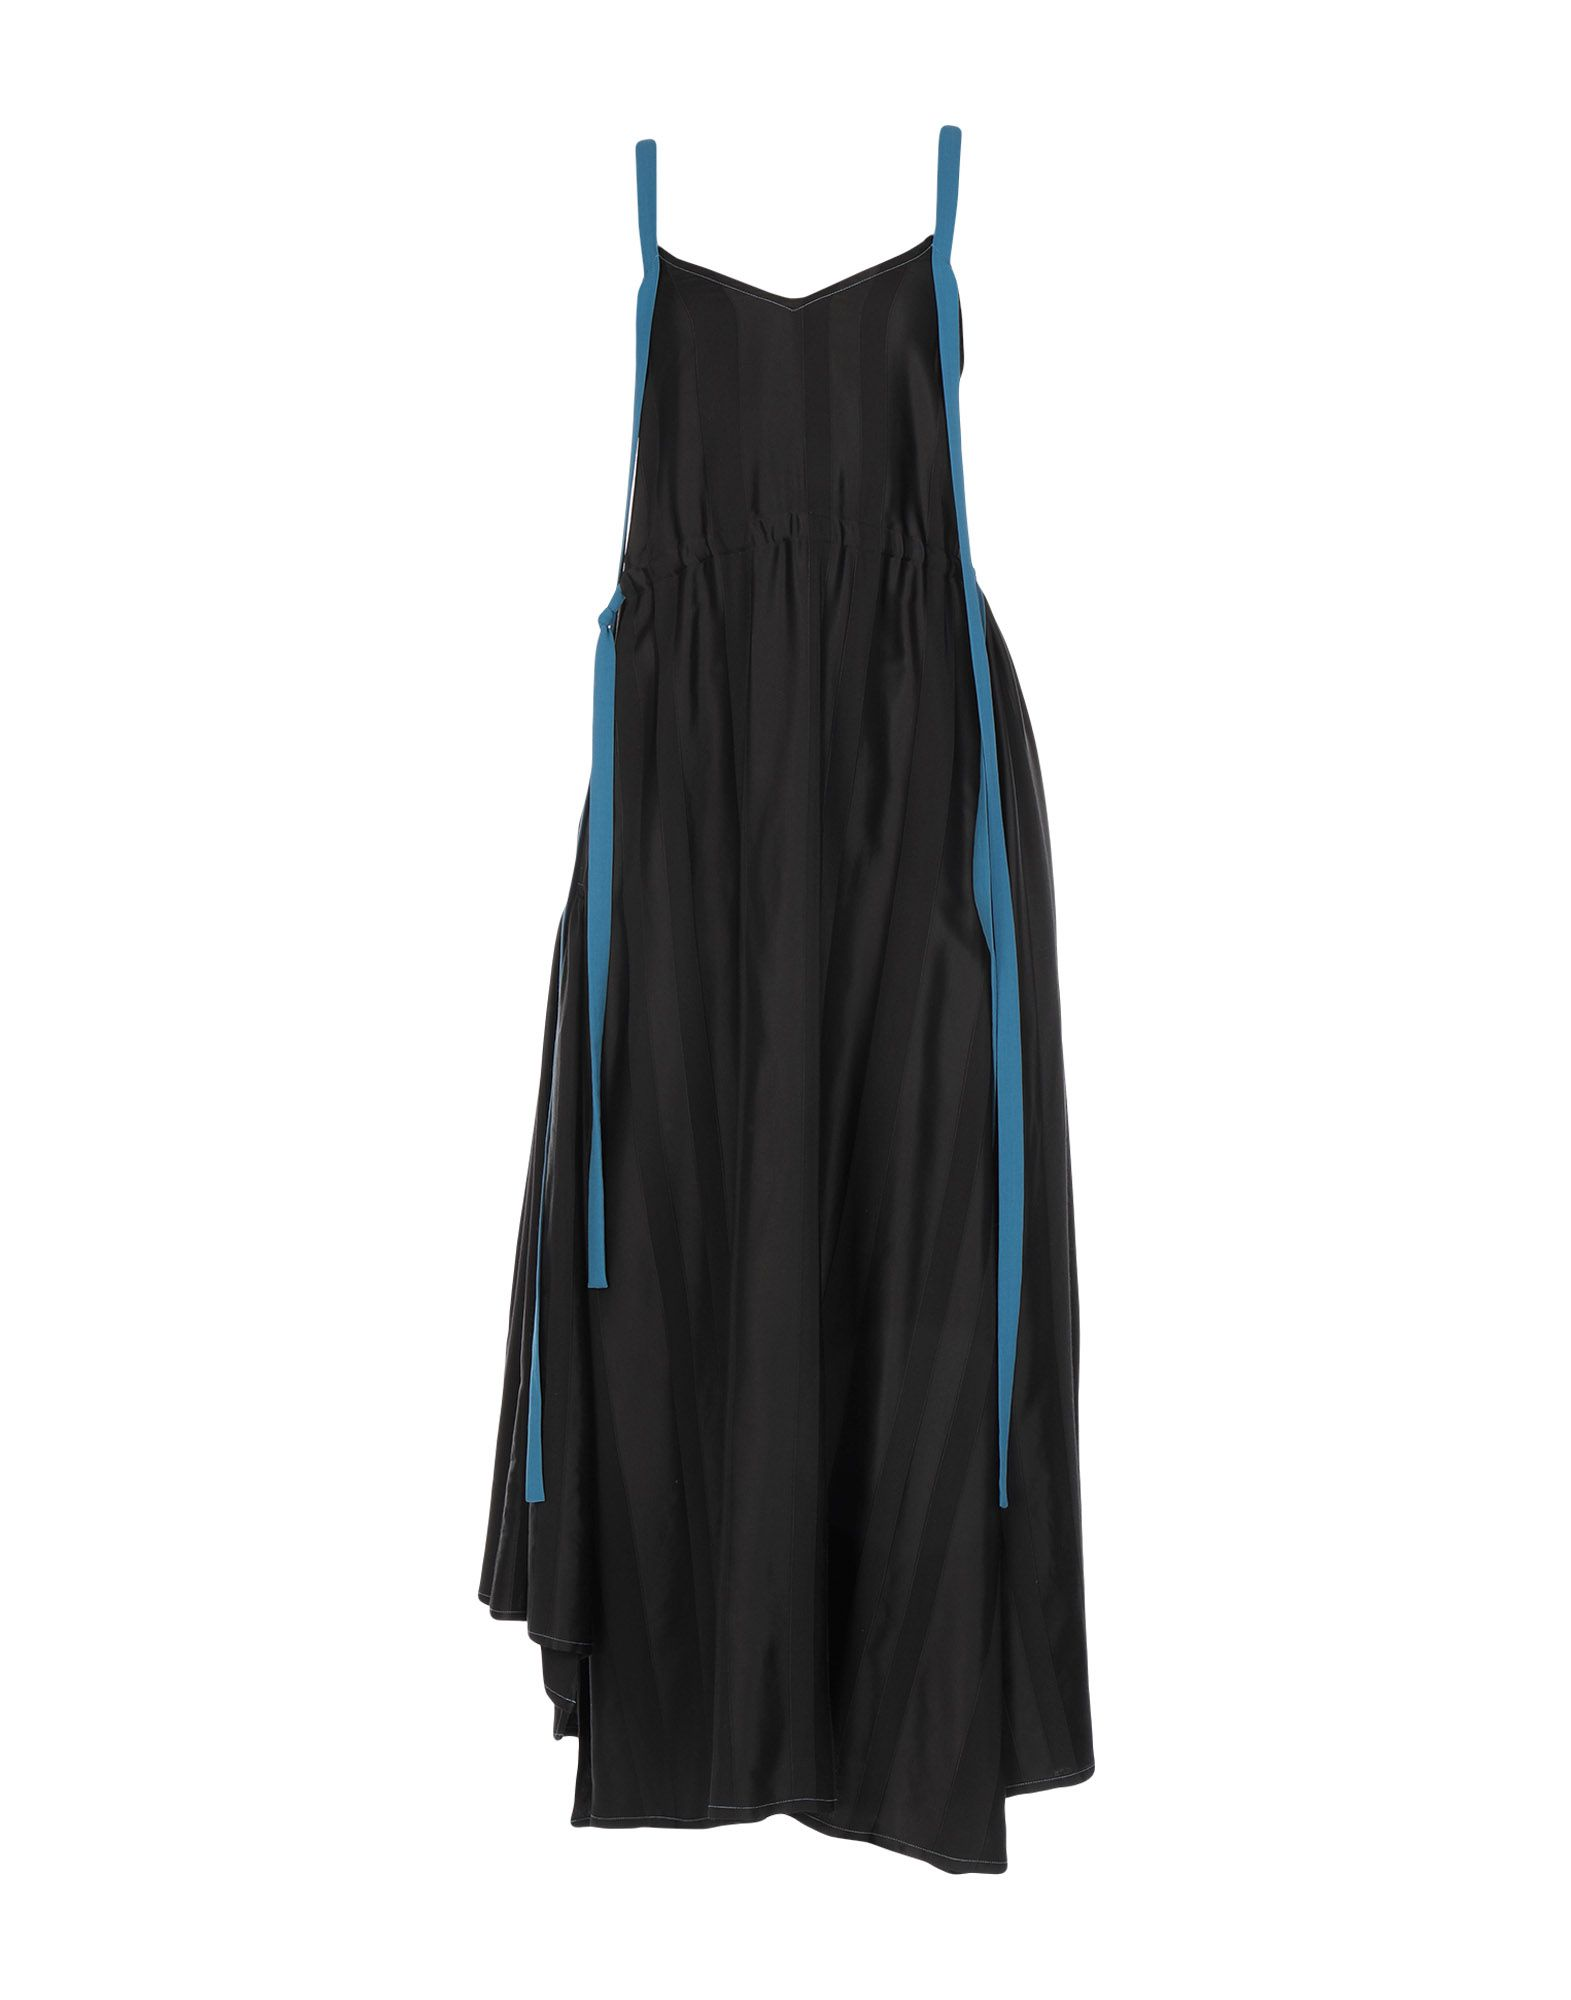 8592ce109e5c 《送料無料》LOEWE レディース ロングワンピース&ドレス ブラック 34 レーヨン 85% /